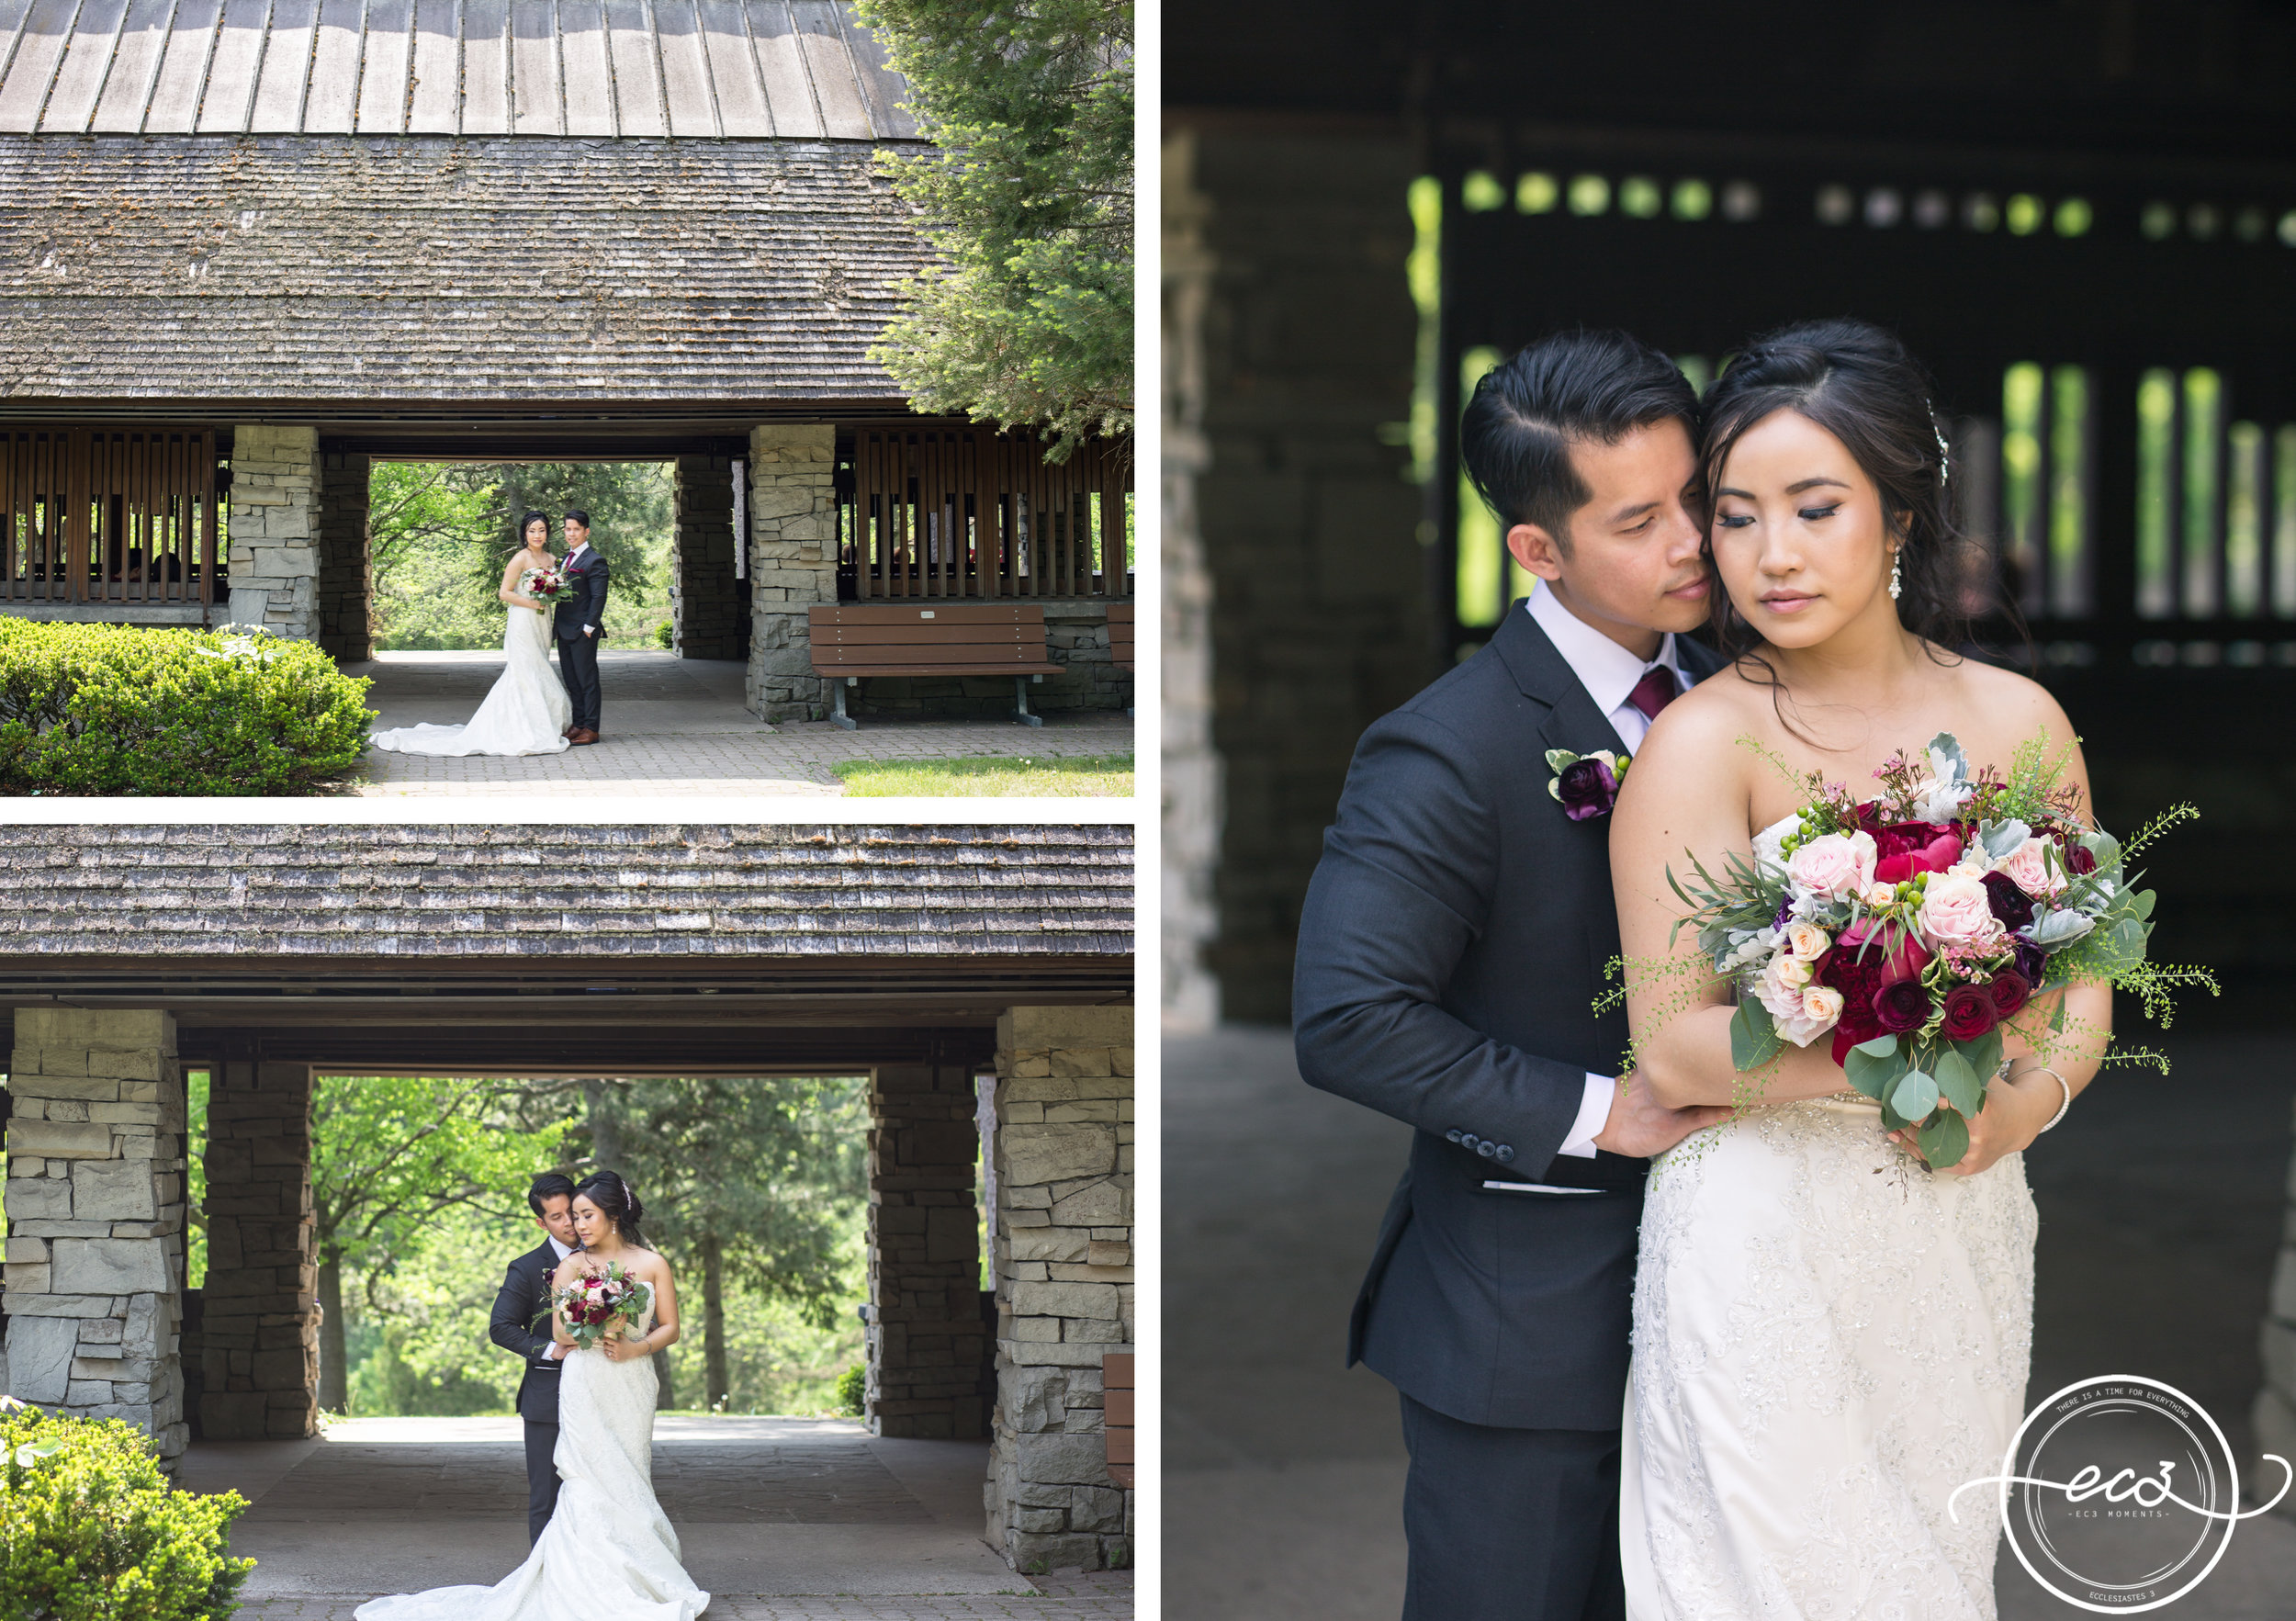 Toronto Edwards Garden and Intimate Vietnamese Wedding17.jpg